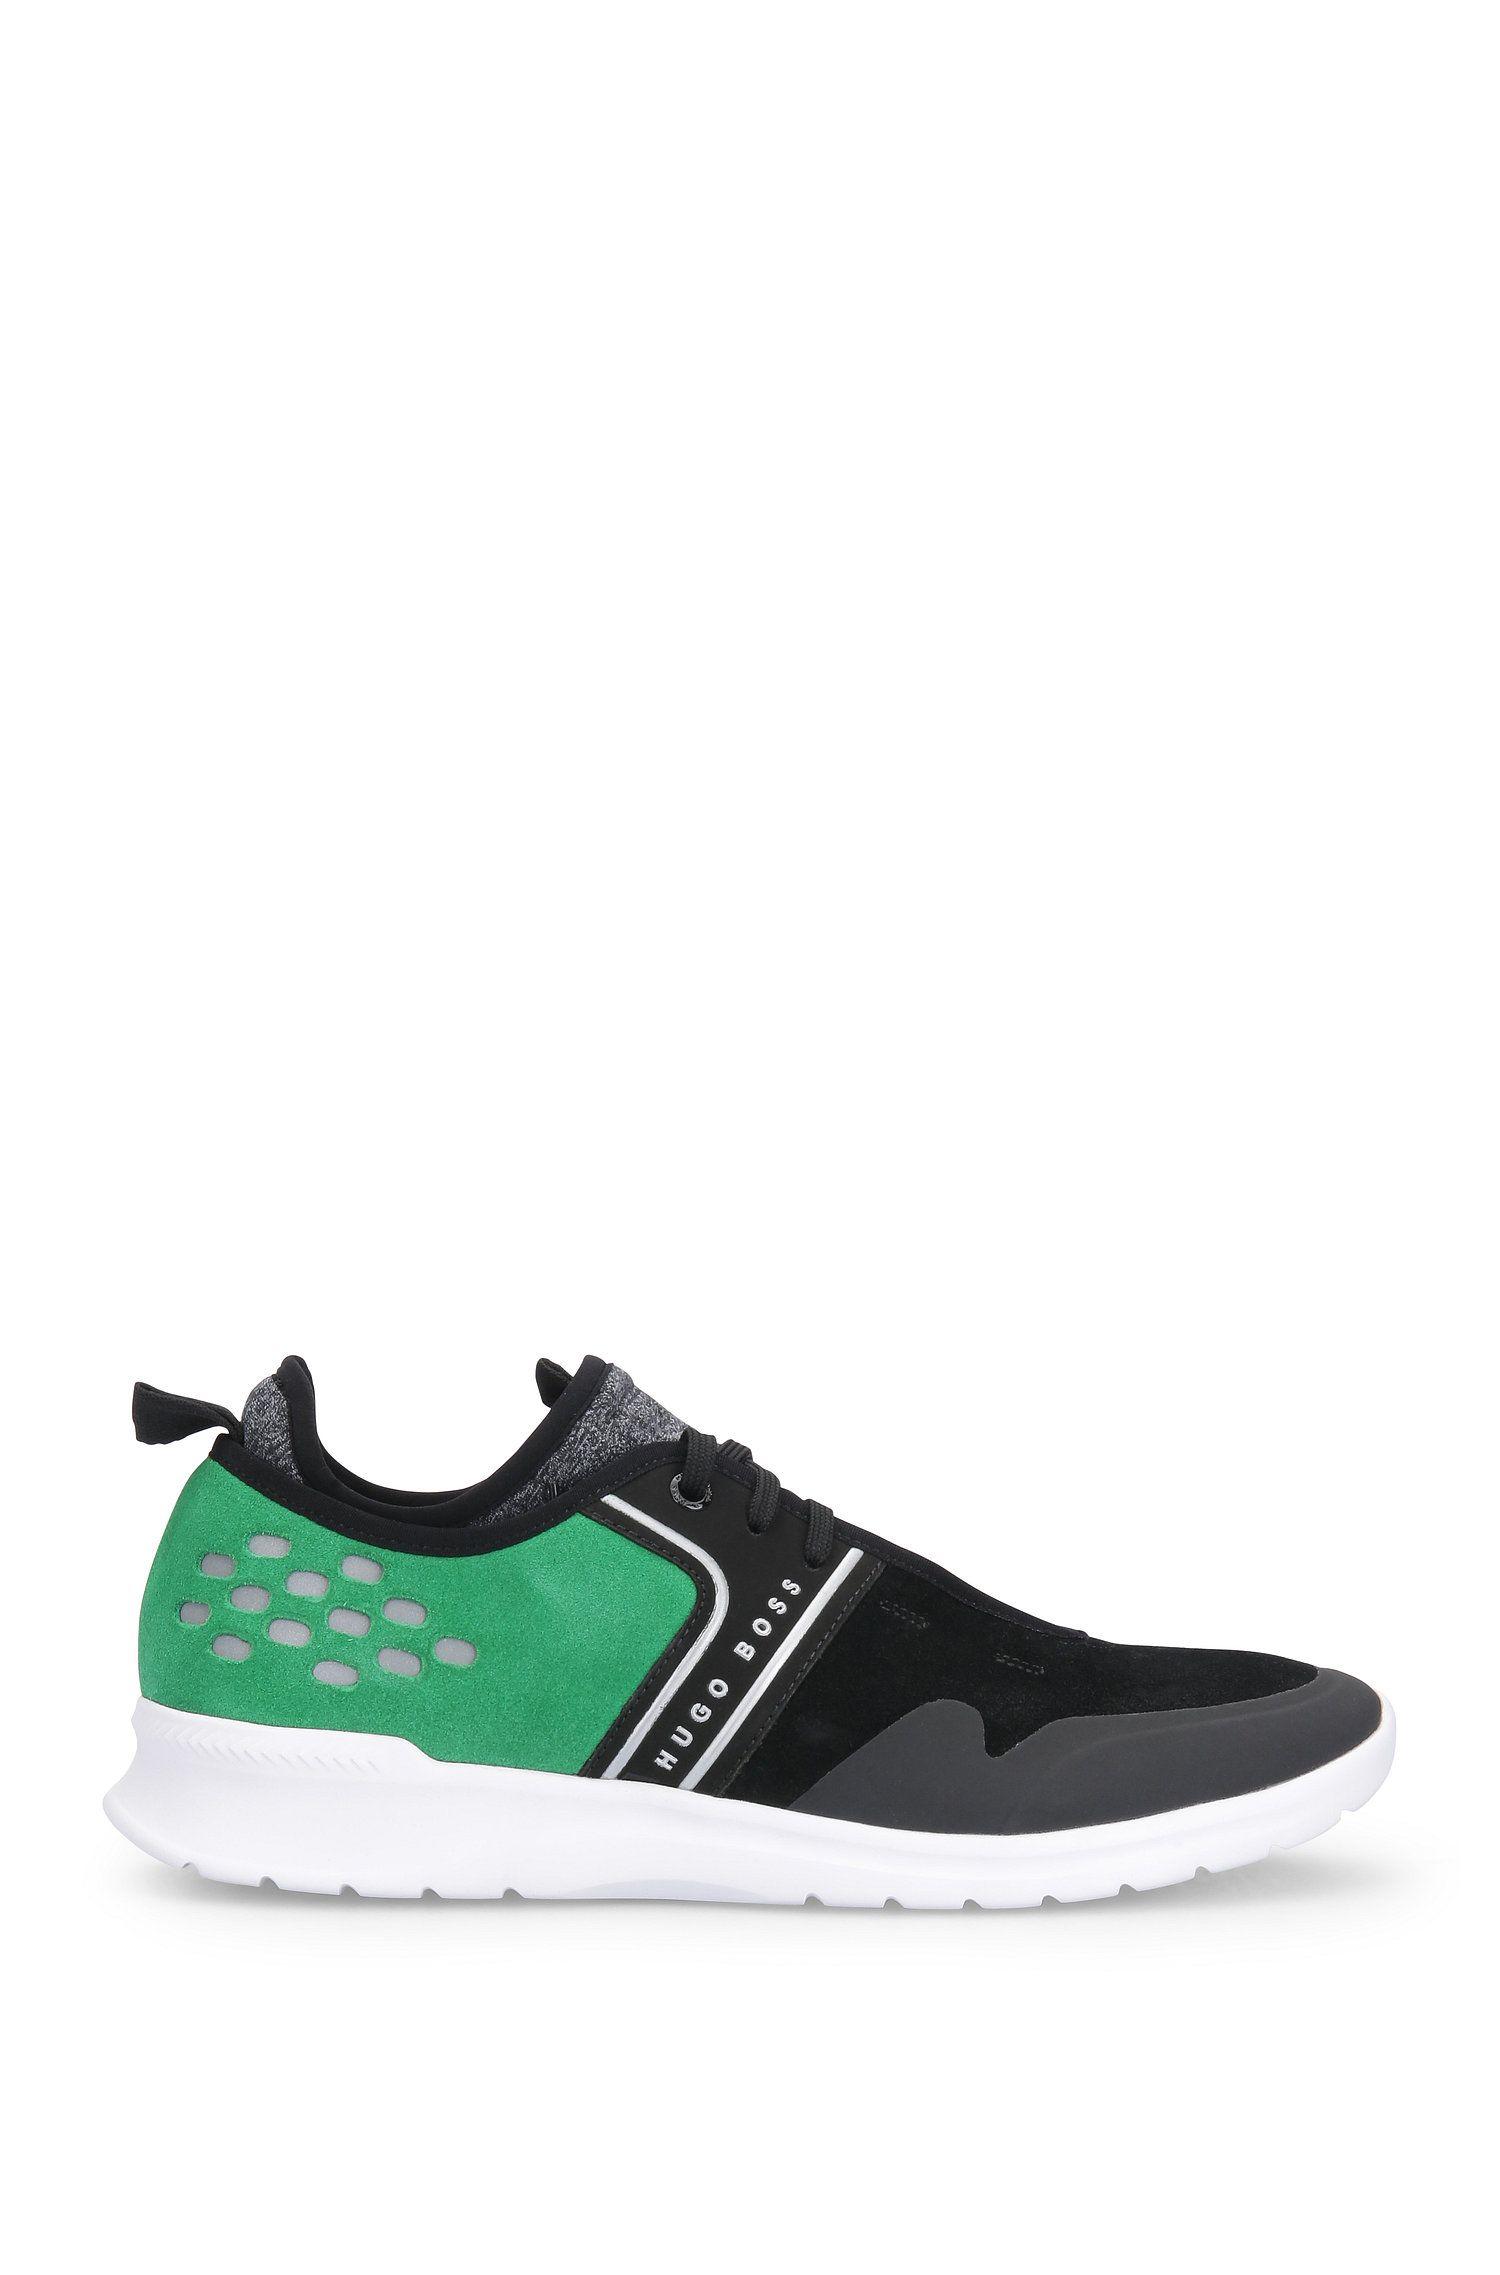 Perforierte Sneakers aus Veloursleder mit Textil: ´Extreme_Runn_sd`